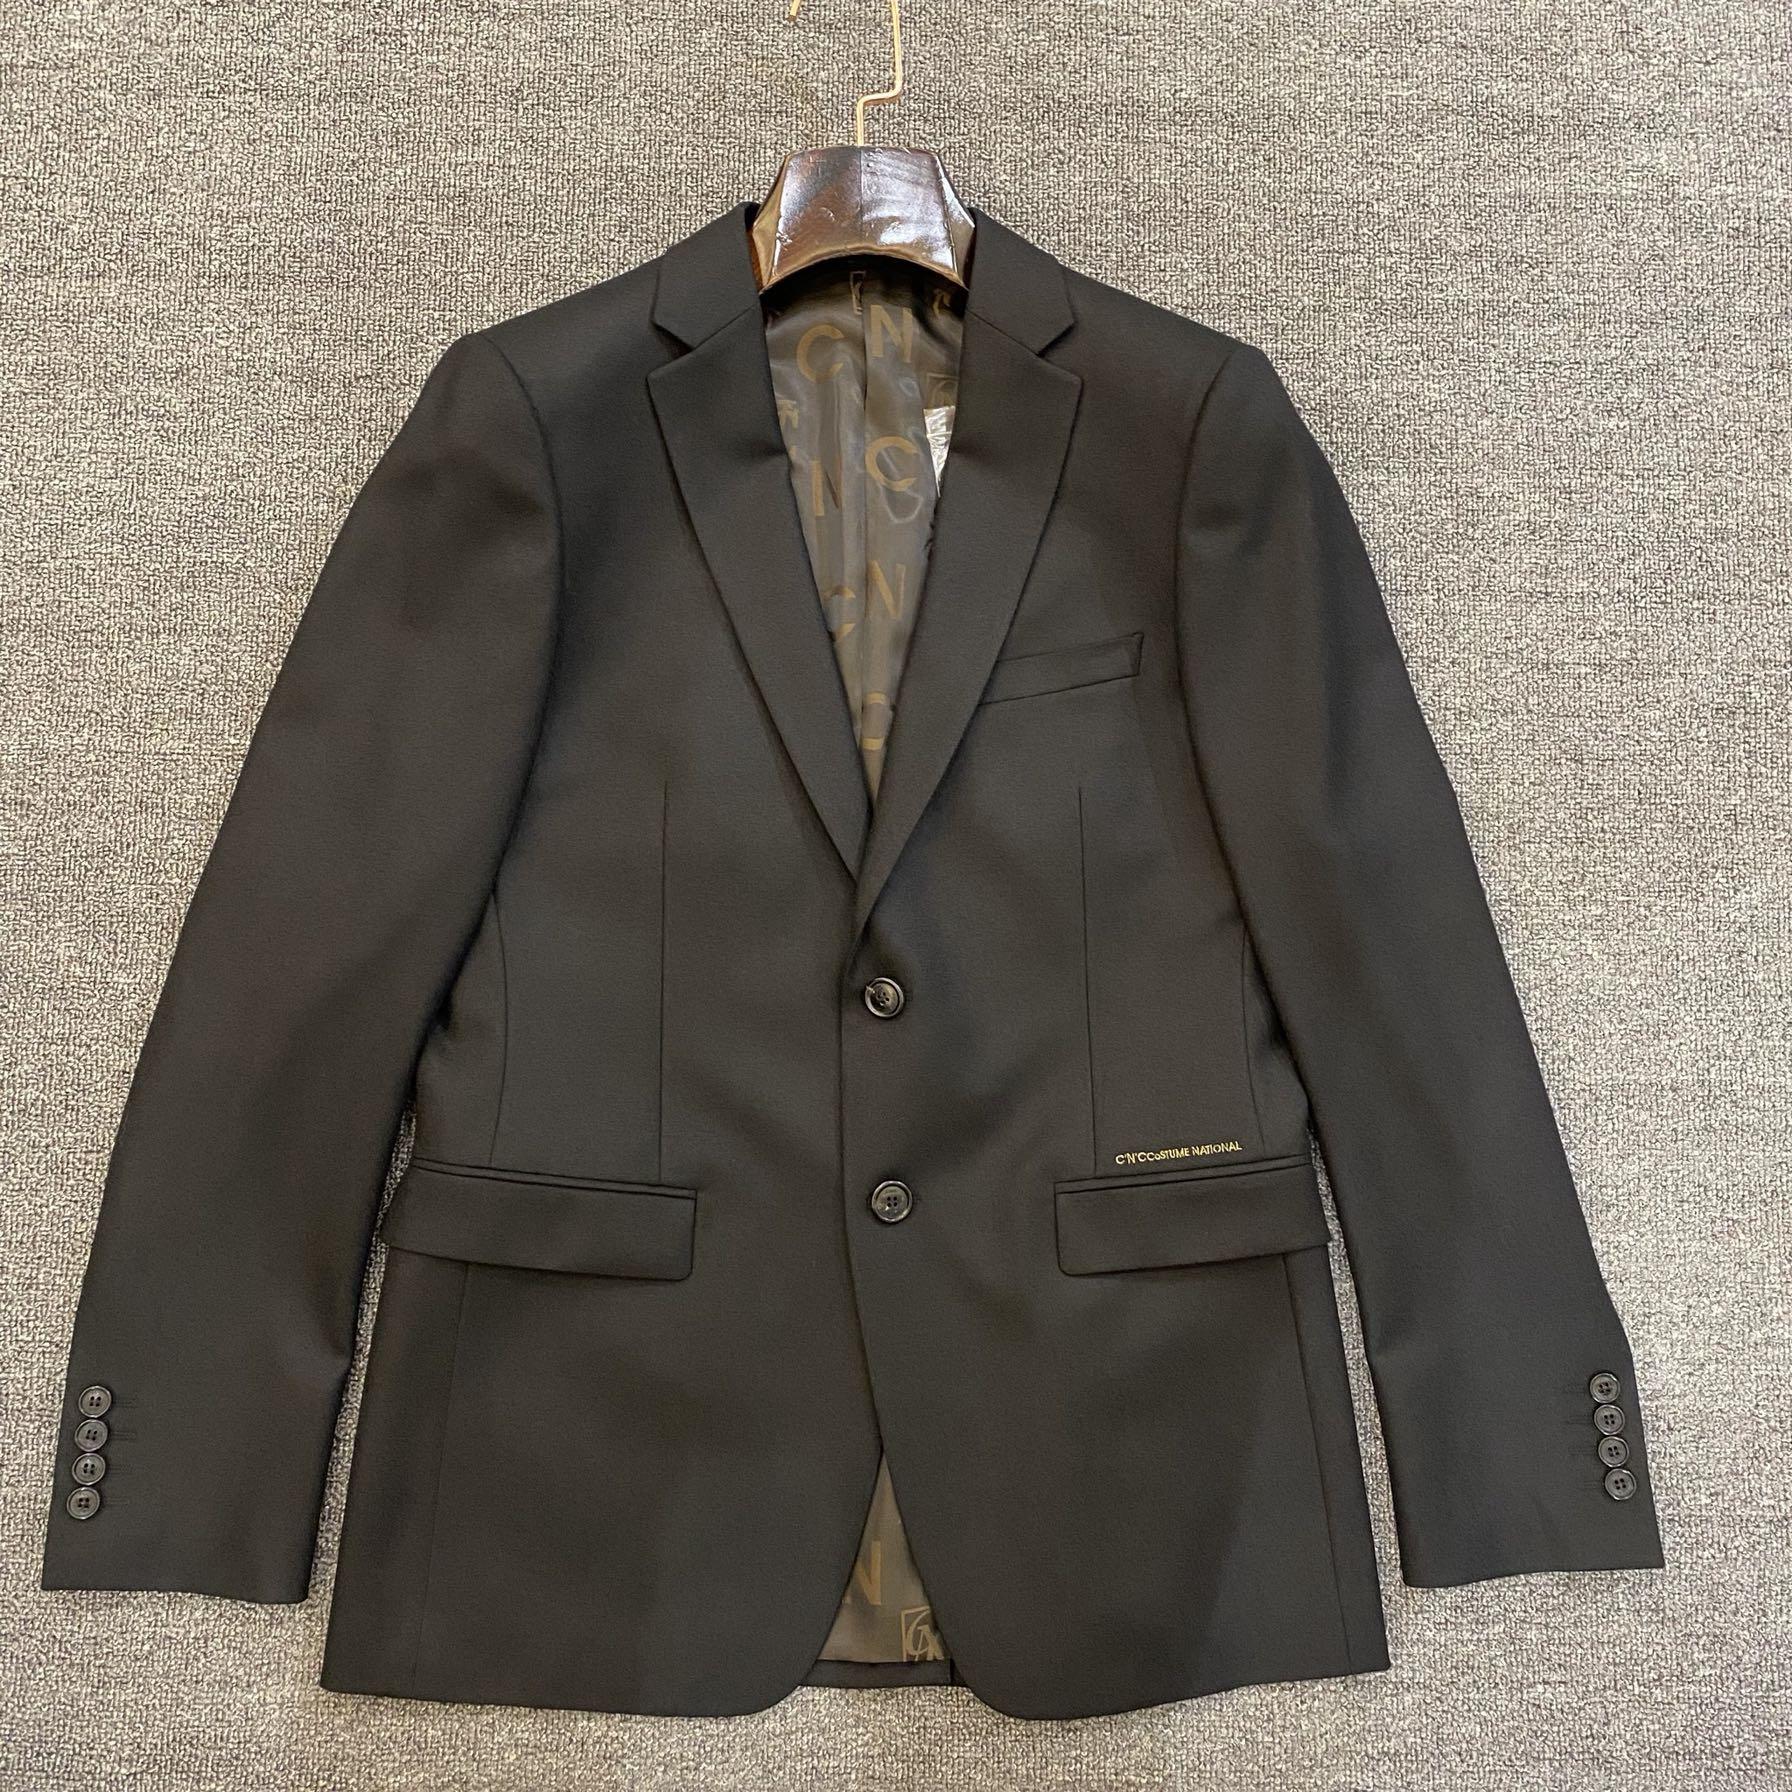 C.N.C cost National Mens suit